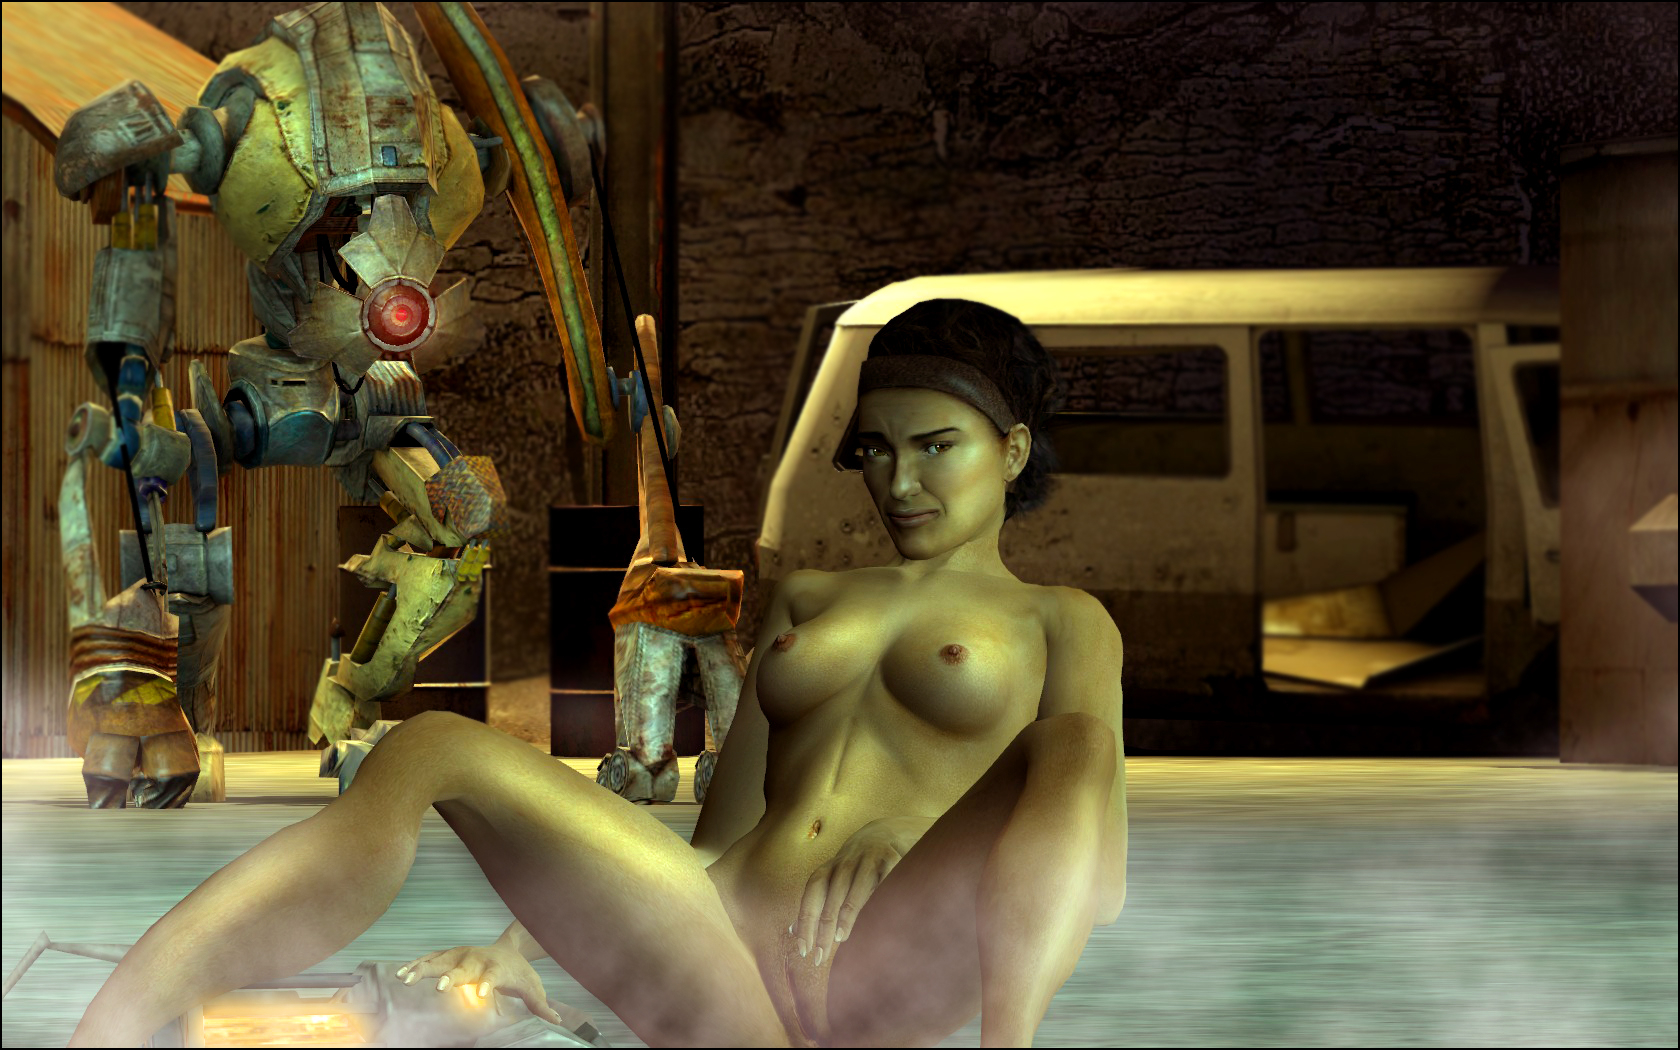 Life nude model half